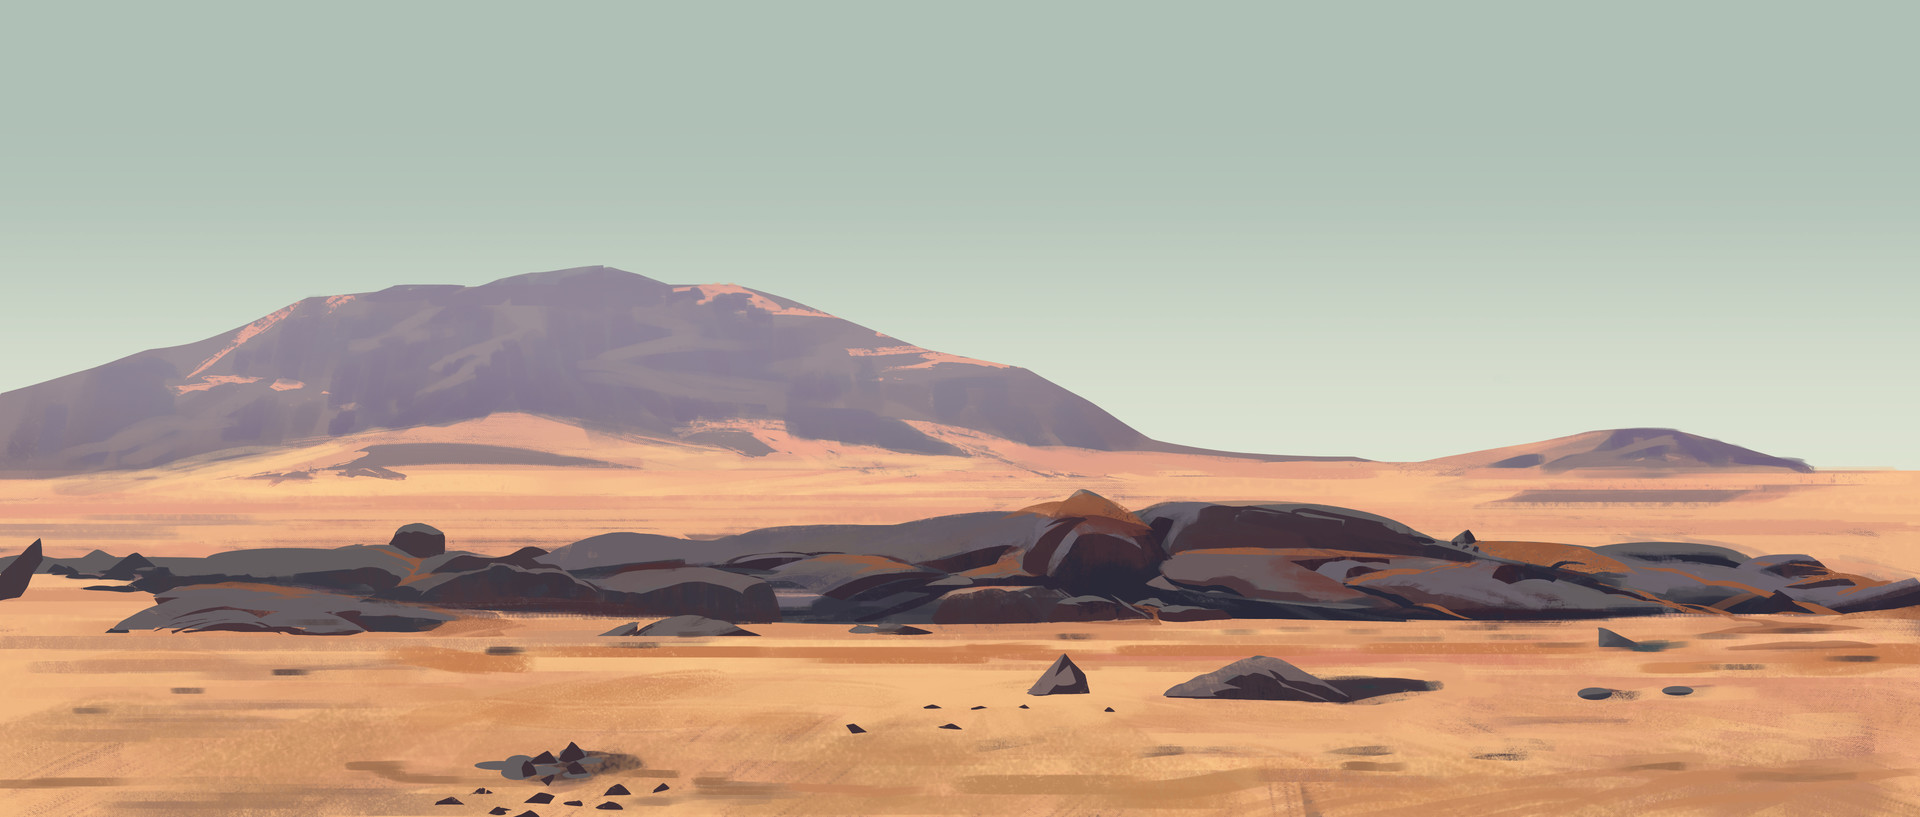 Harrison yinfaowei 16 9 17 starship troopers